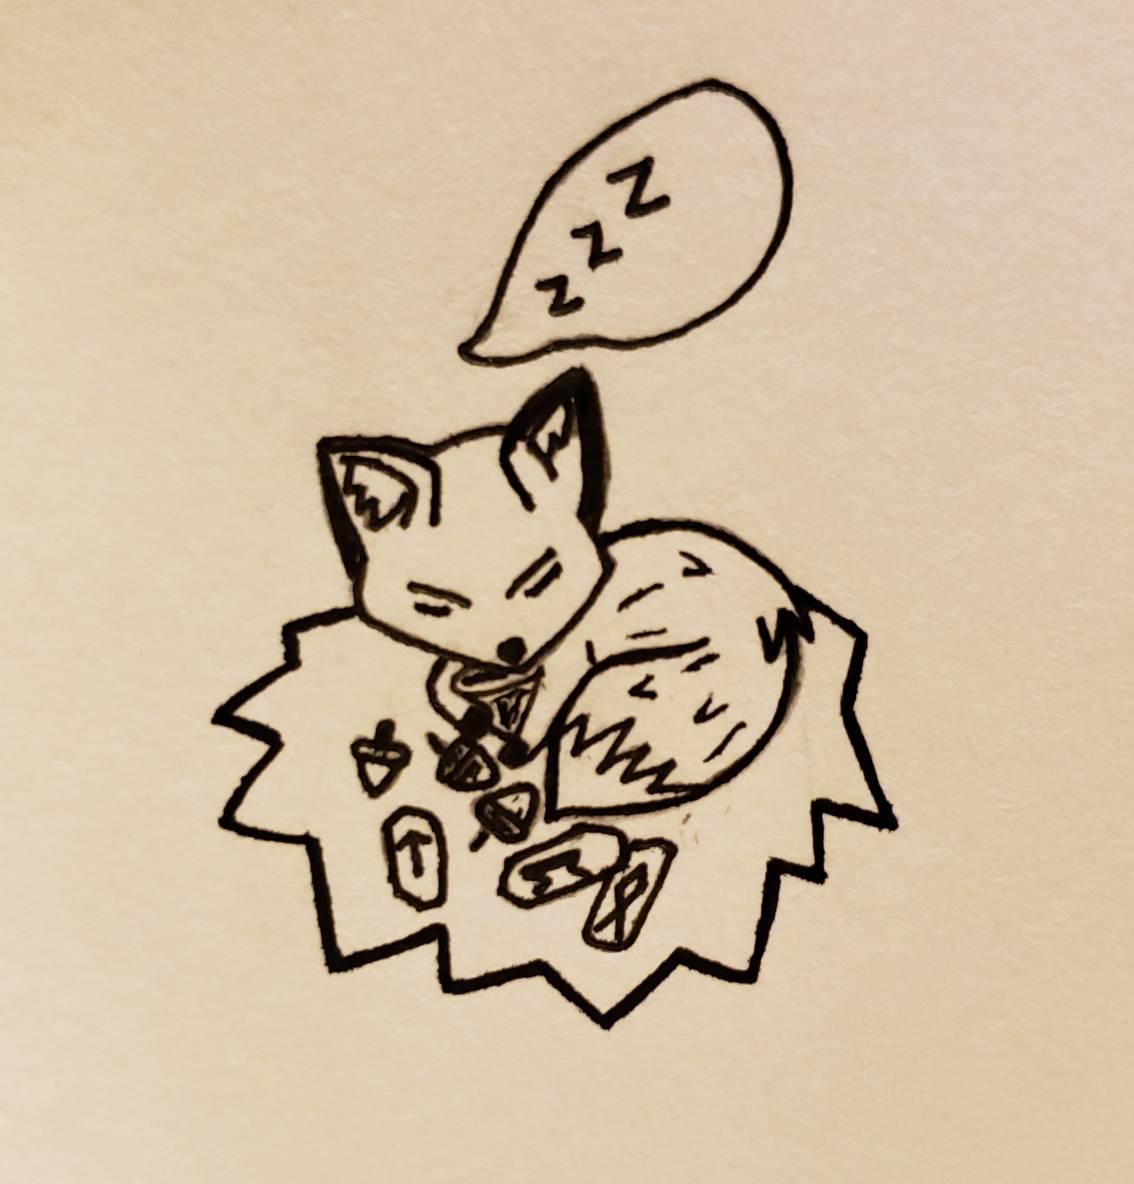 Inktober 2020: Fox, Sleep, Acorn(s), Rune Stones